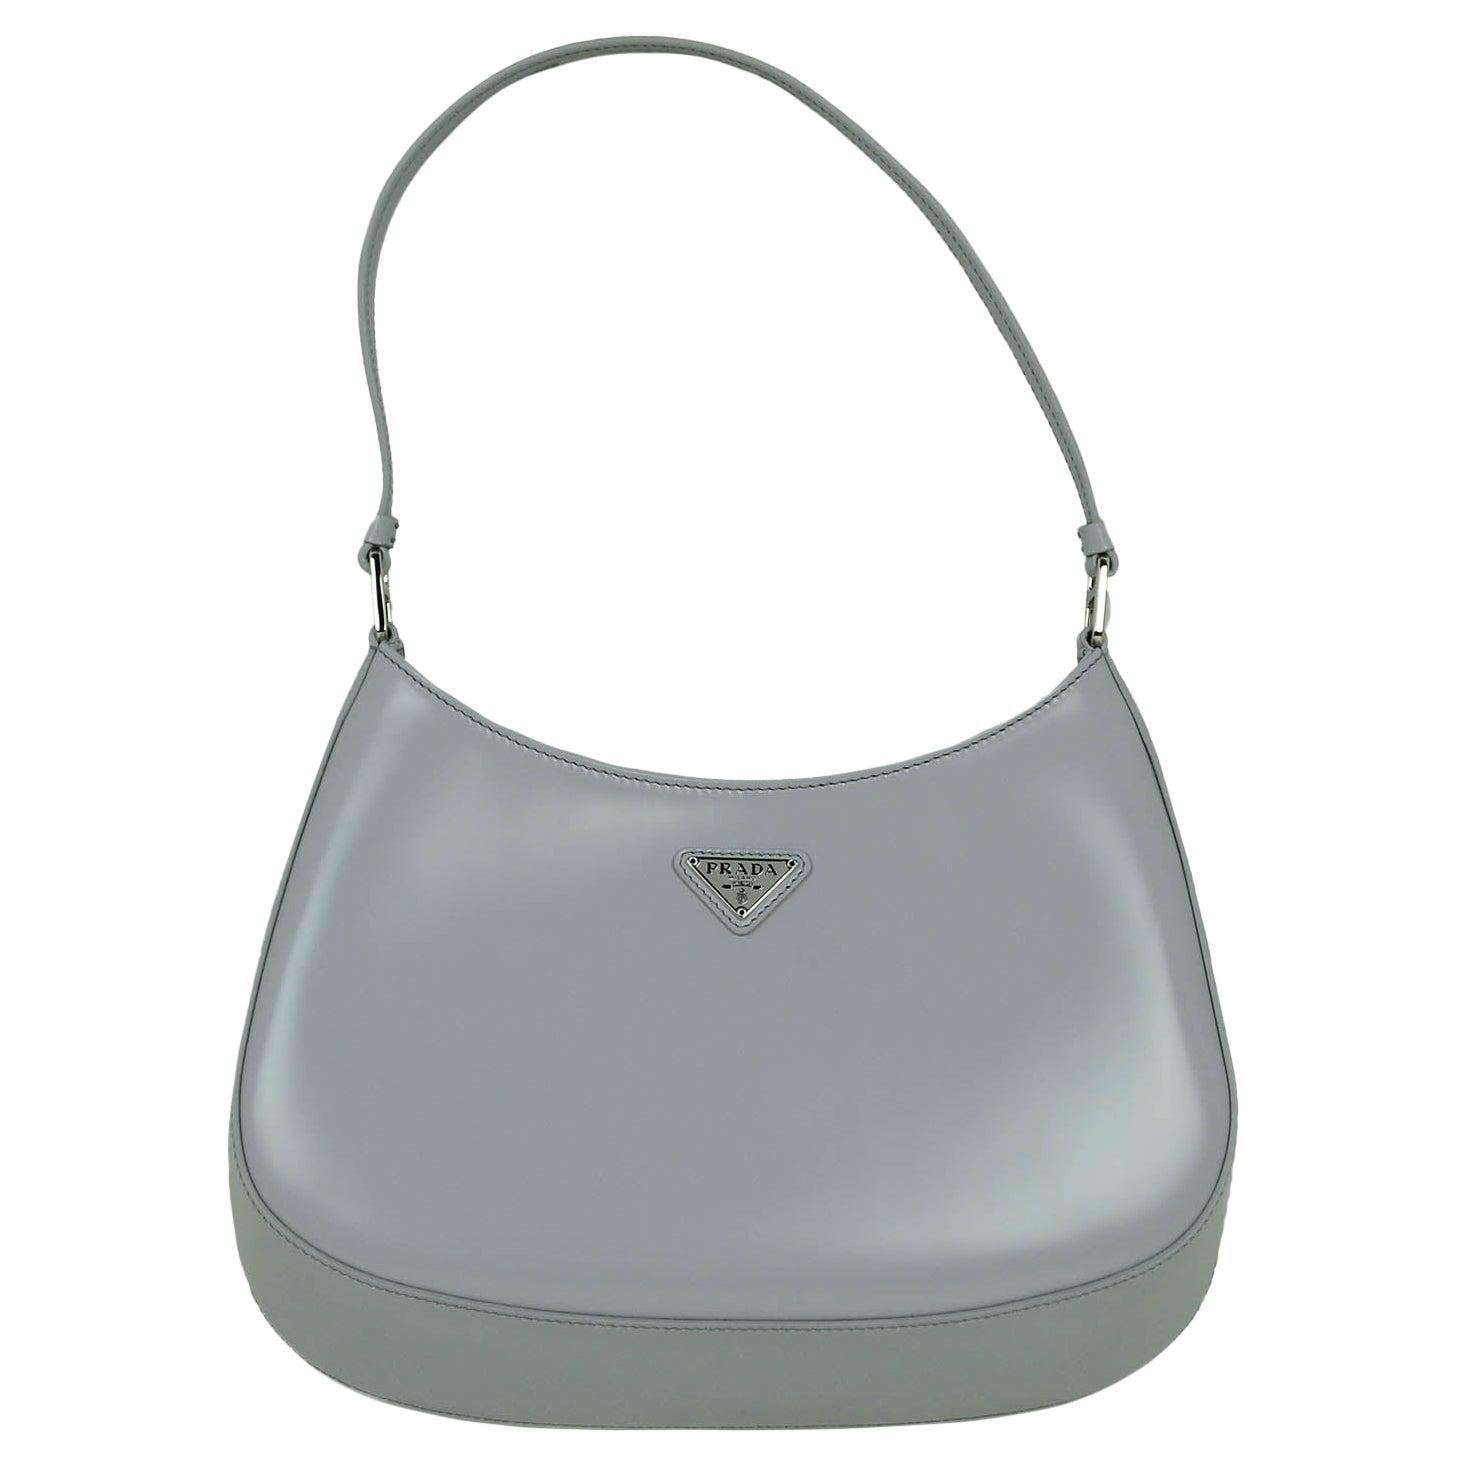 Prada LIKE NEW Cornflower Blue Brushed Calfskin Cleo Shoulder Bag